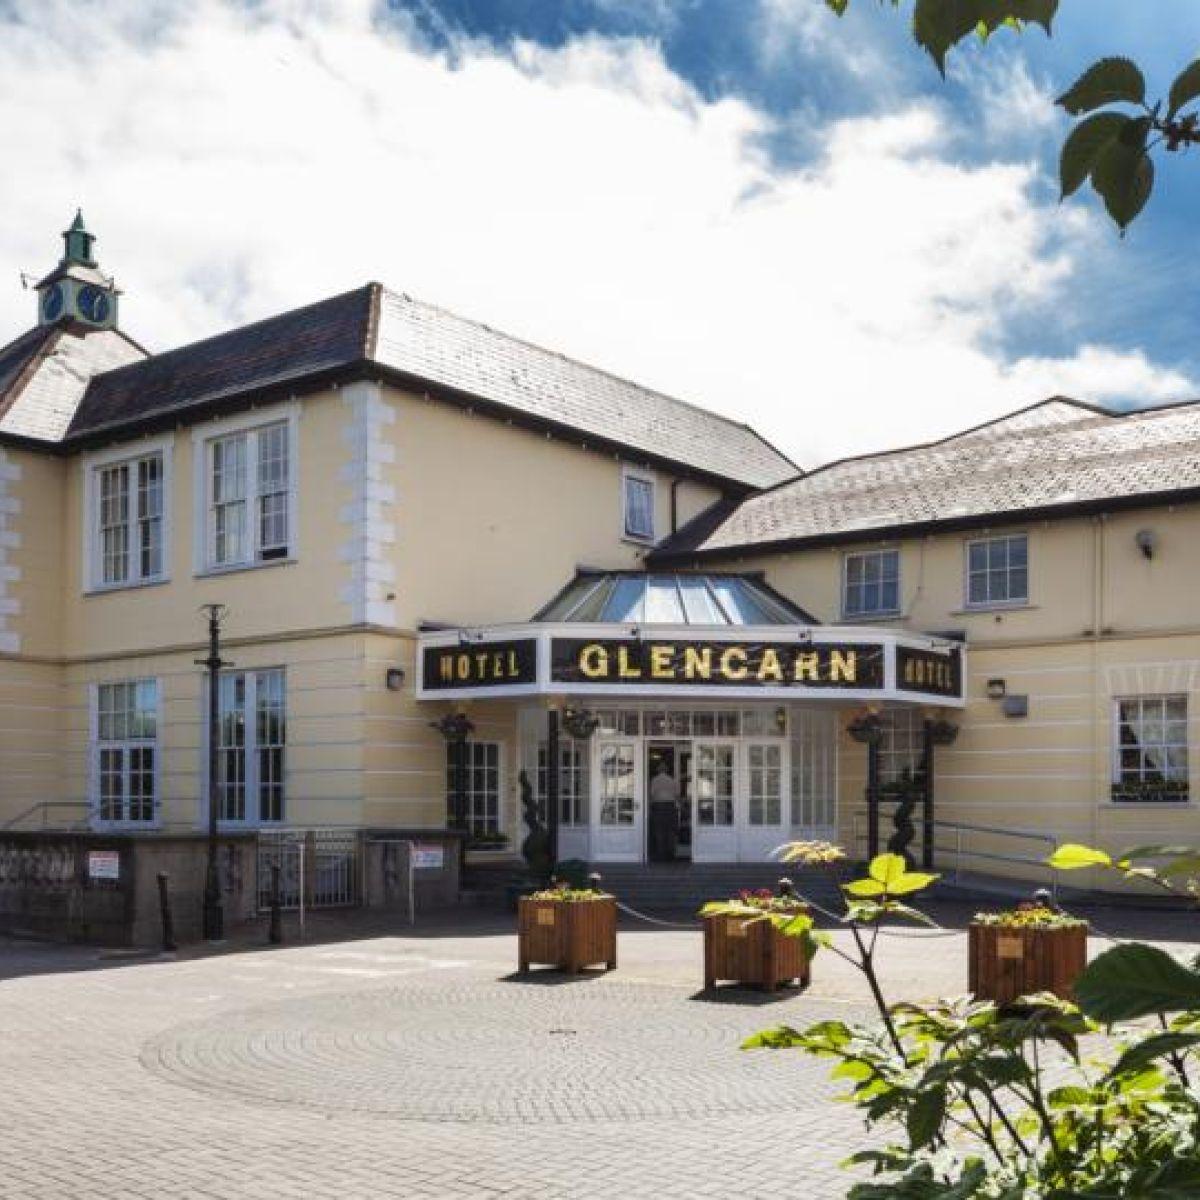 Man set for court over fatal Castleblayney crash - The Irish Times